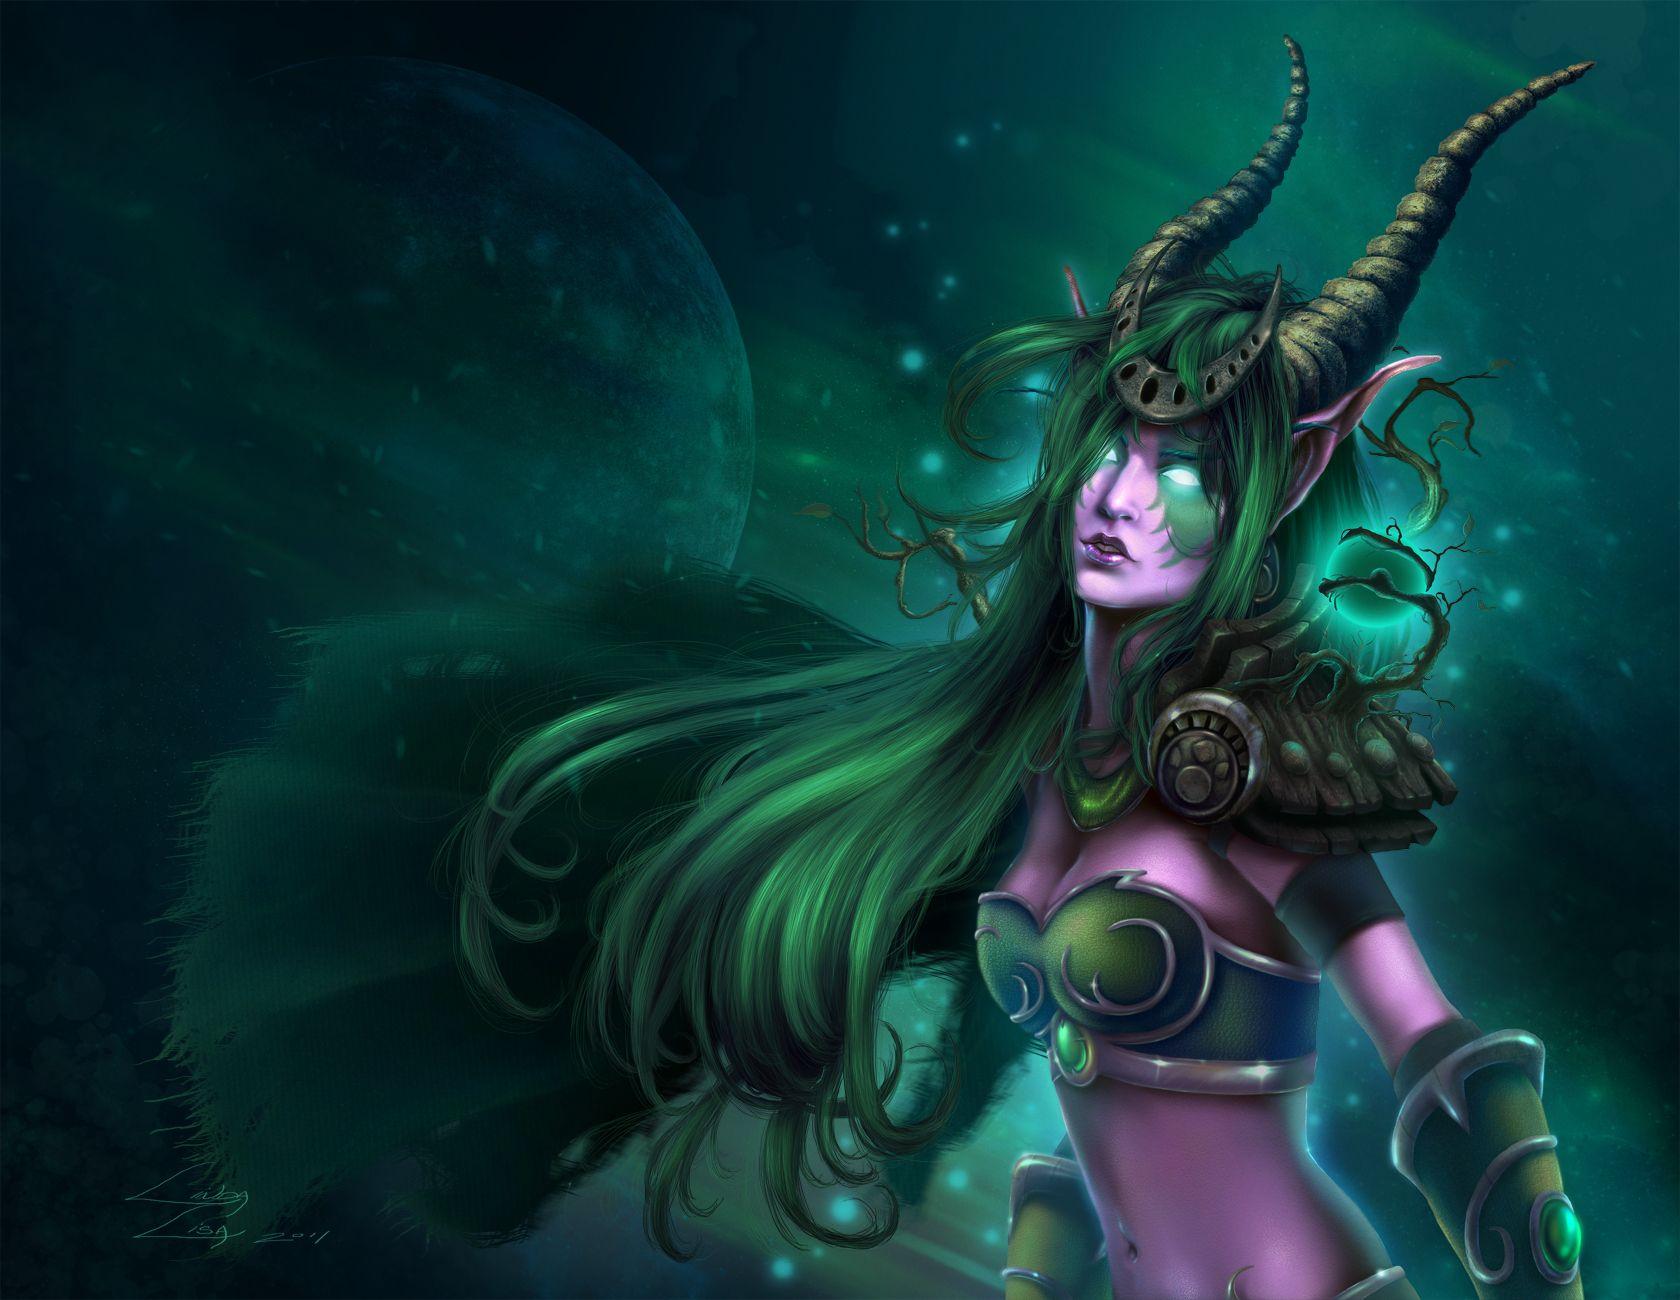 Congratulate, World of warcraft night elf